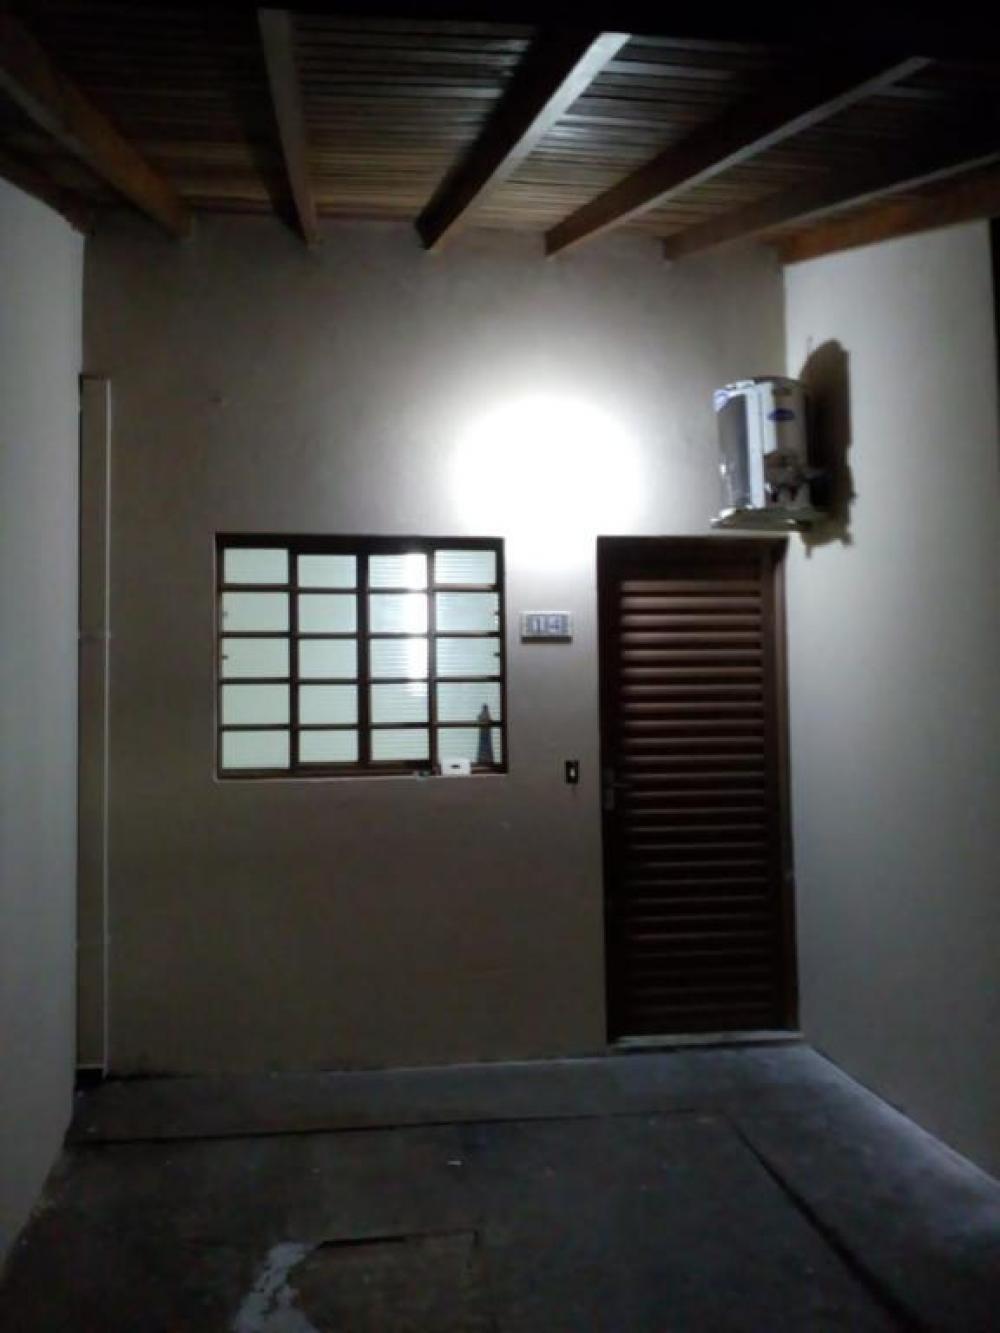 Comprar Casa / Condomínio em Mirassol R$ 168.000,00 - Foto 6